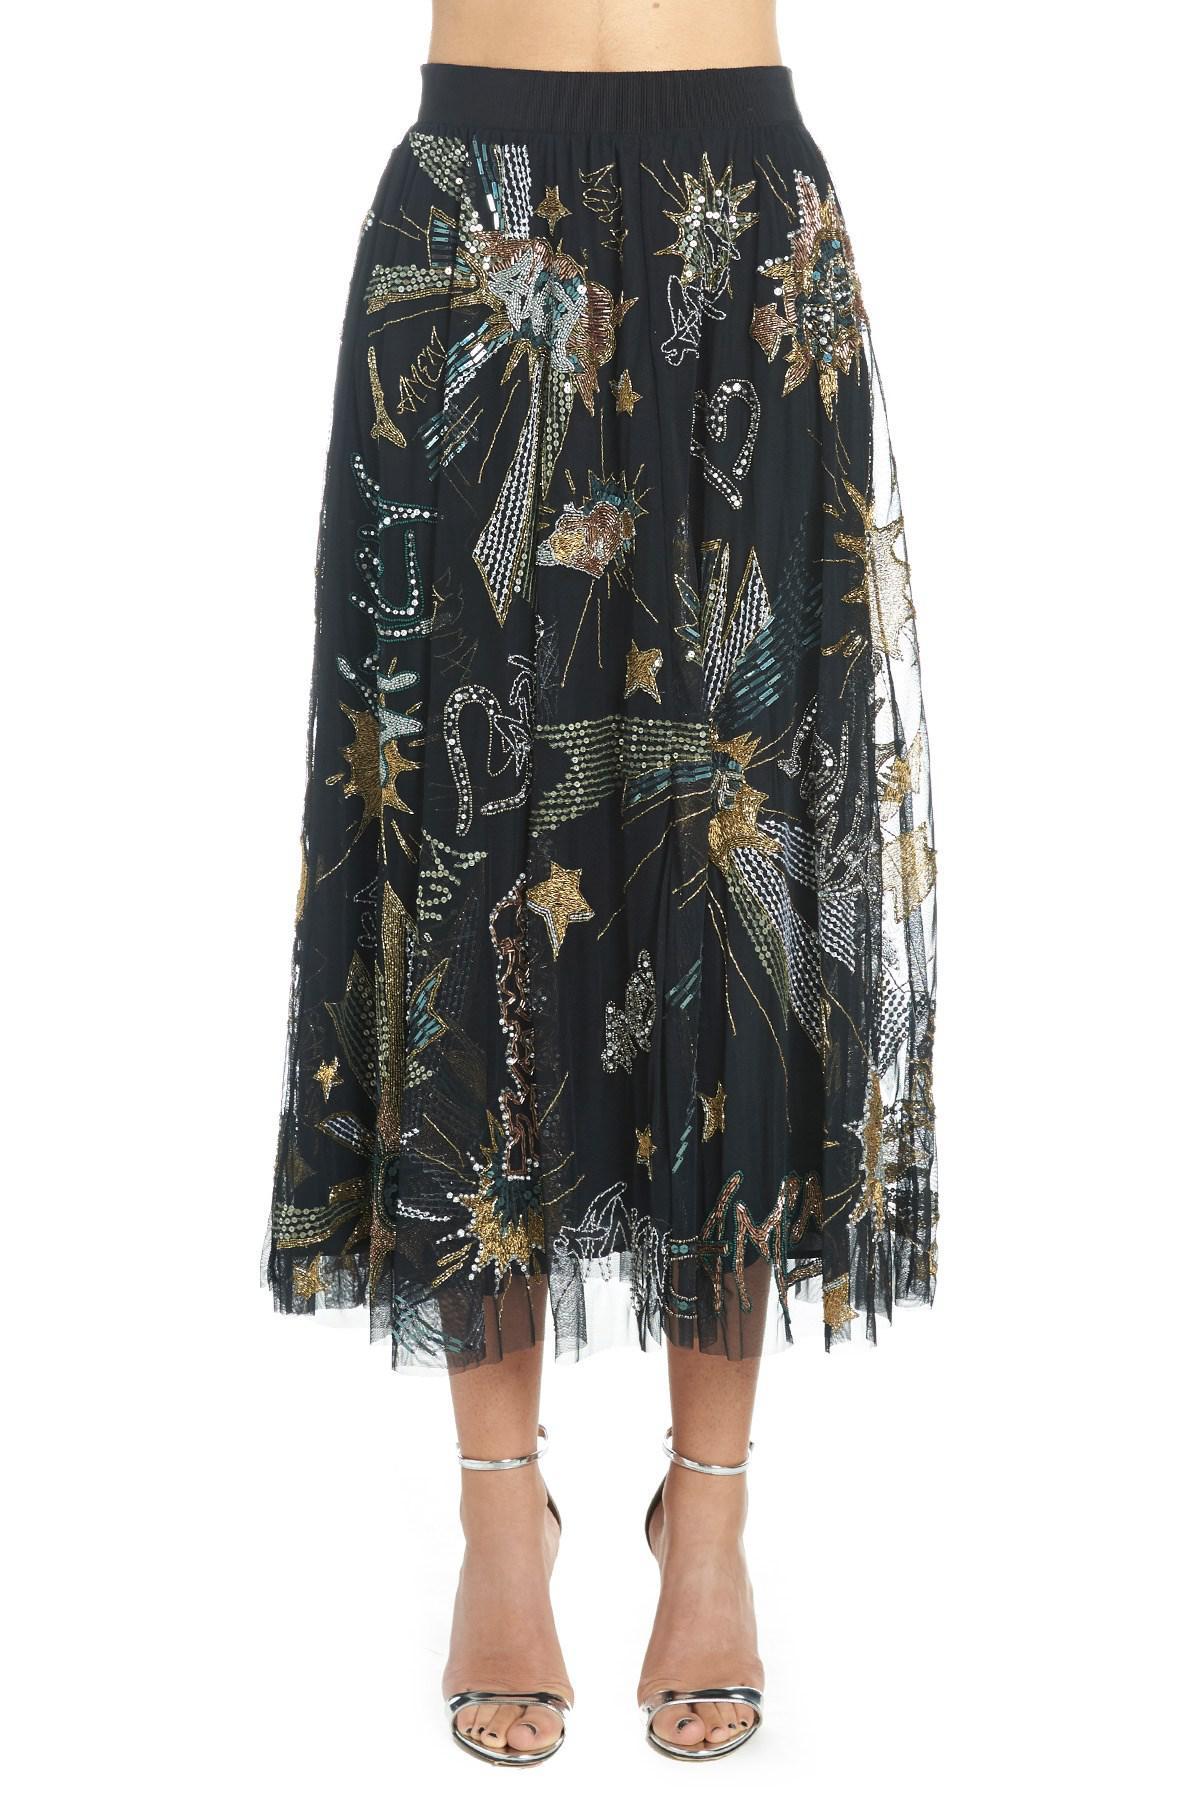 efd202424 Amen - Black Embellished Flared Skirt - Lyst. View fullscreen